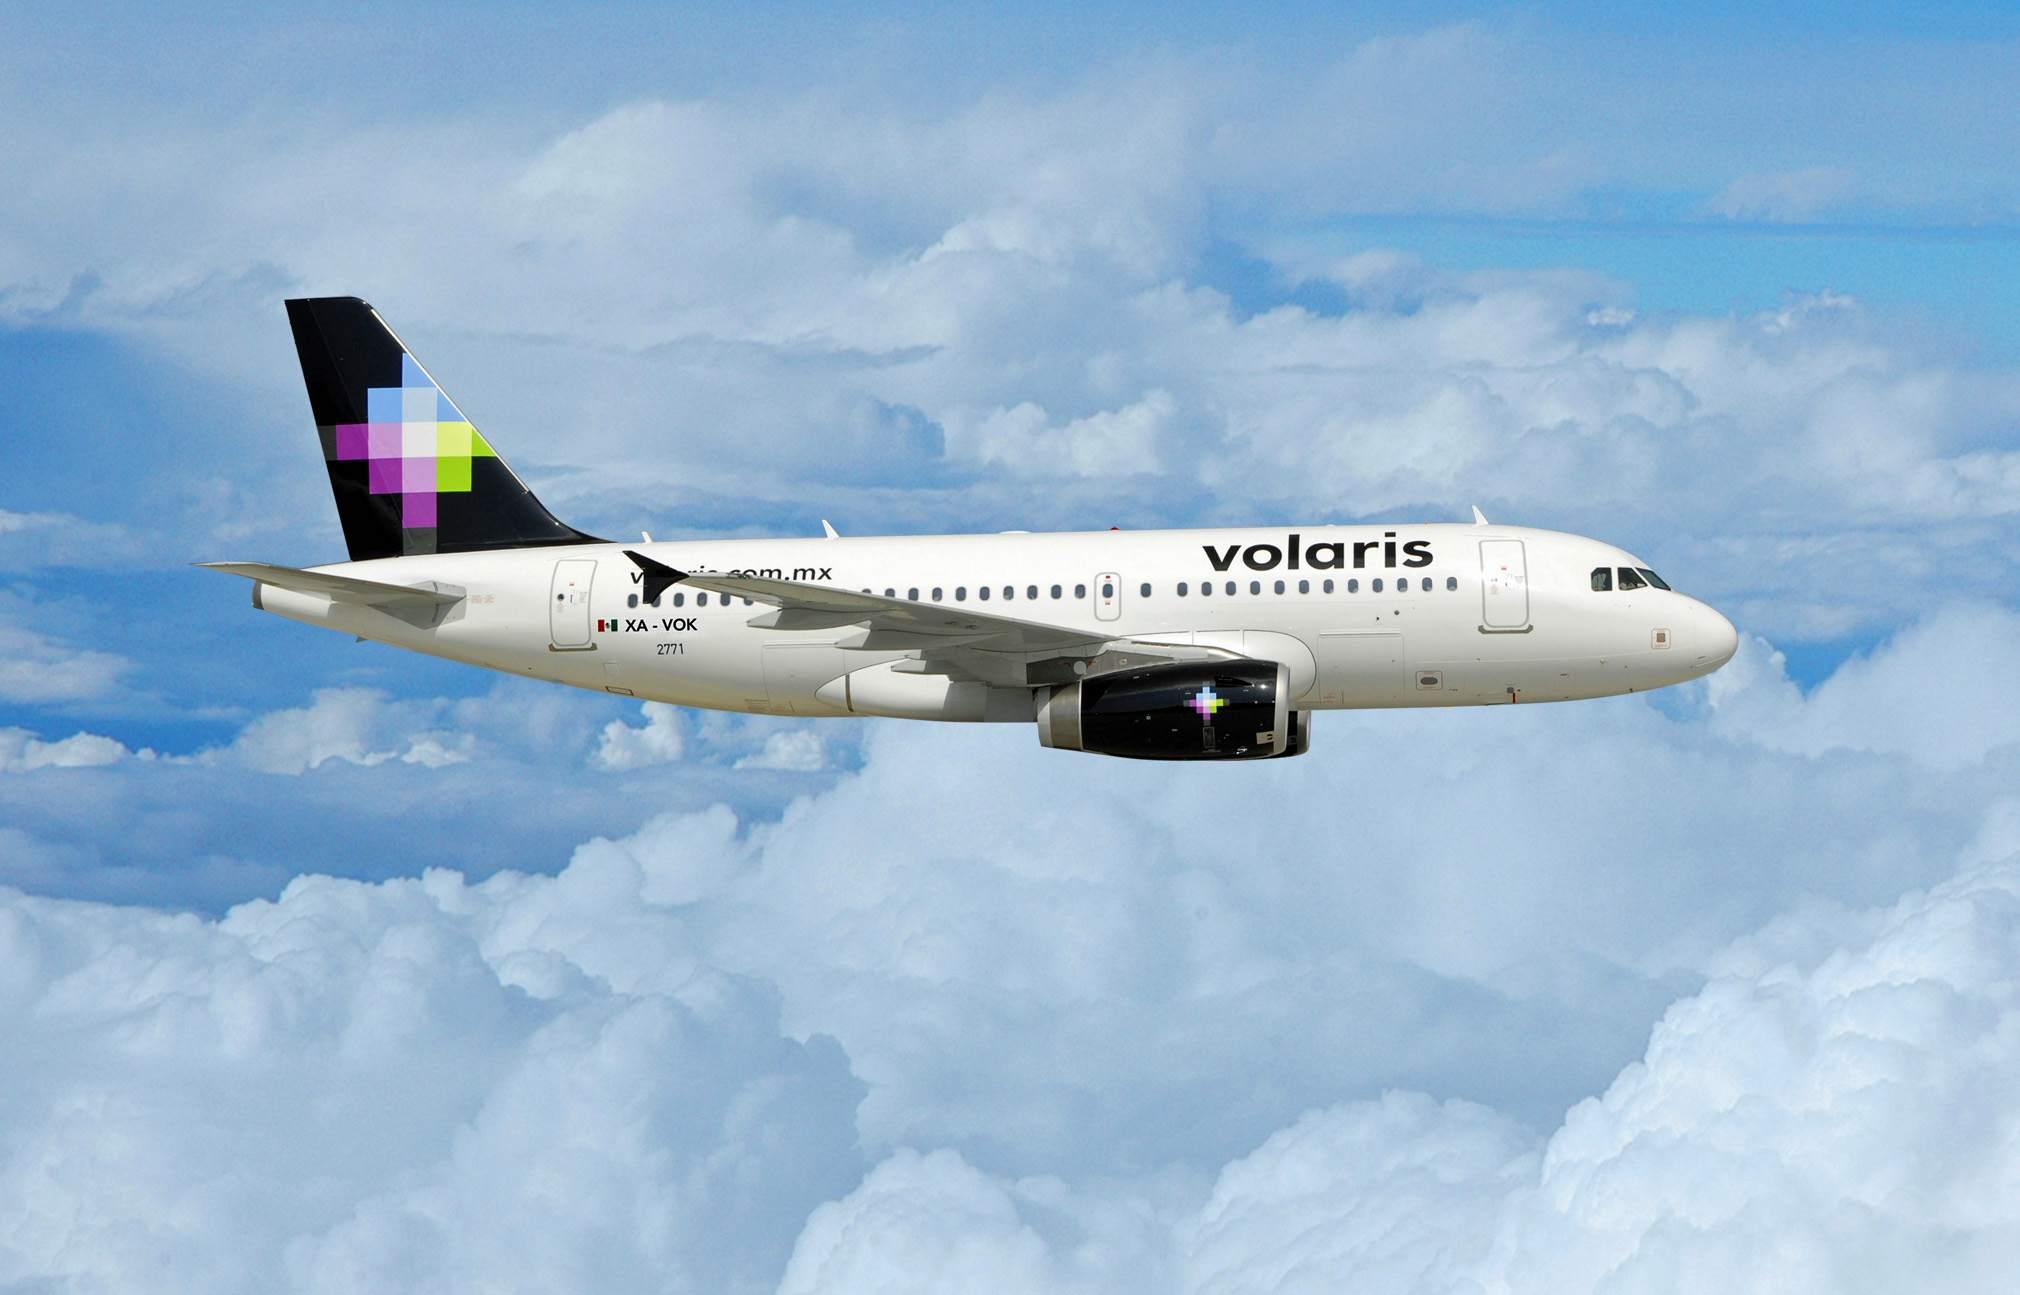 Volaris plane soars over clouds